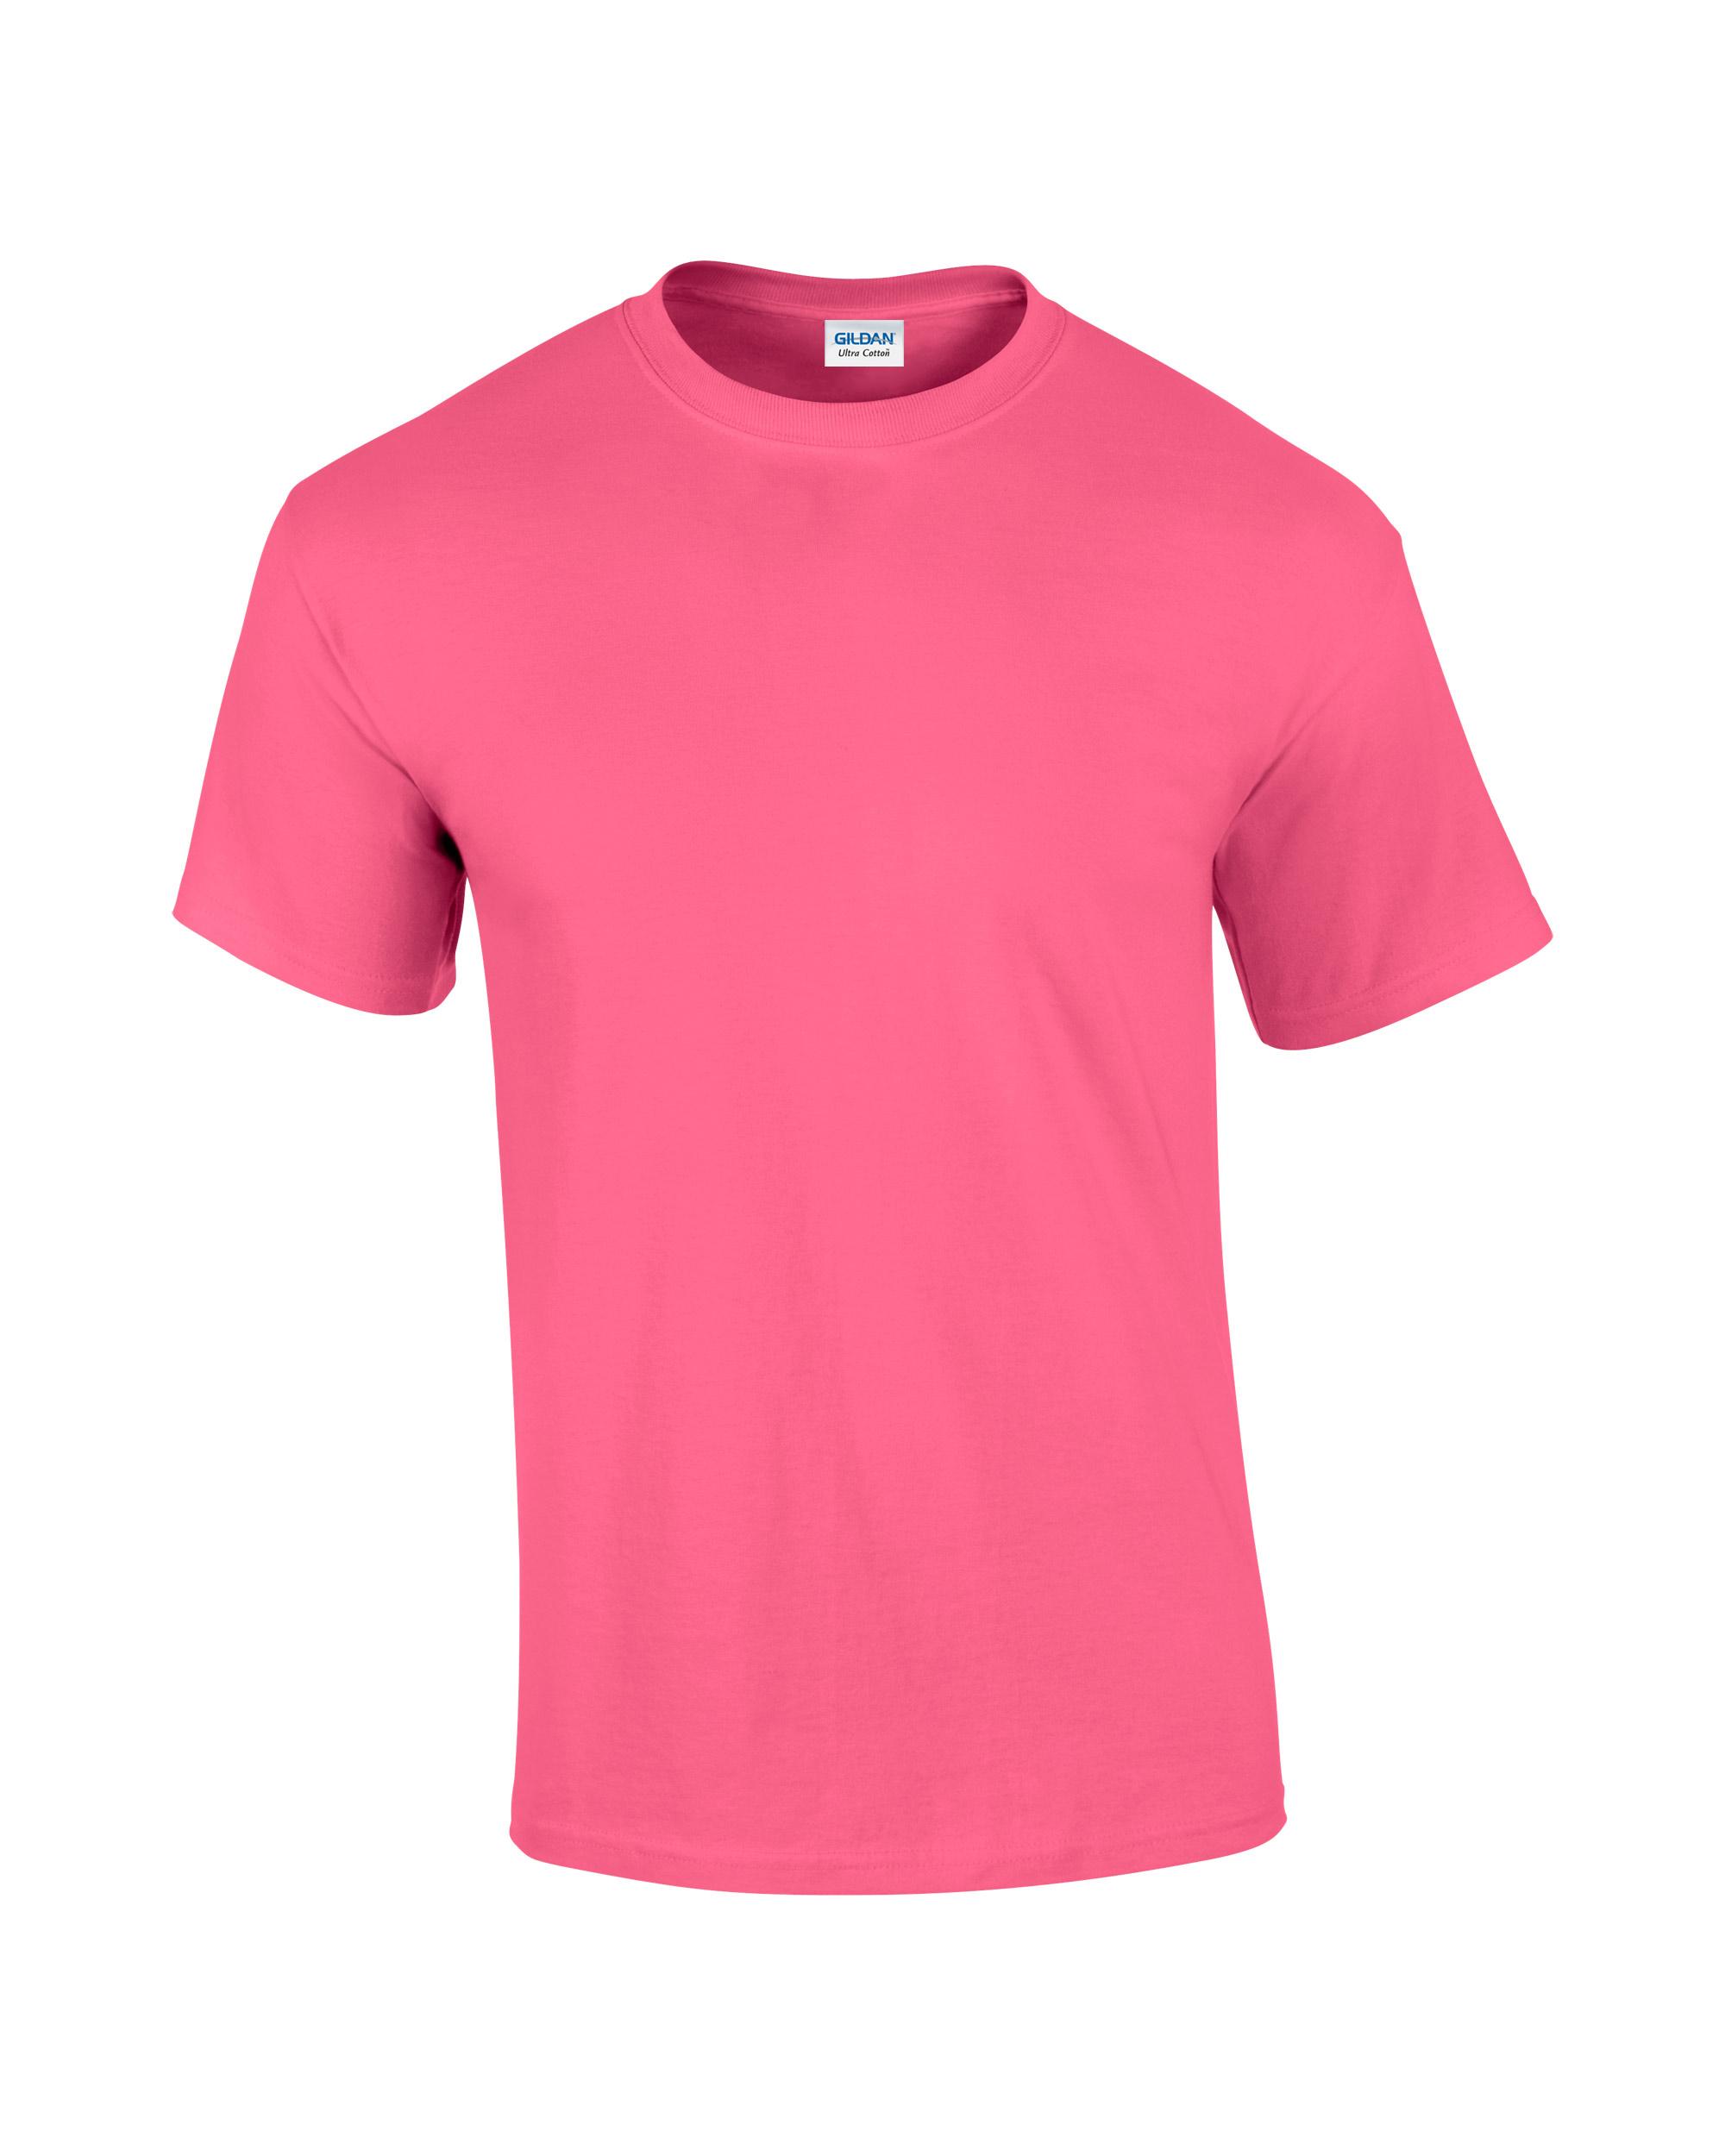 T shirt design red -  2000 1915c_safety Pink 6 0 Oz Ultra Cotton Mens Shirts Ladies Shirts